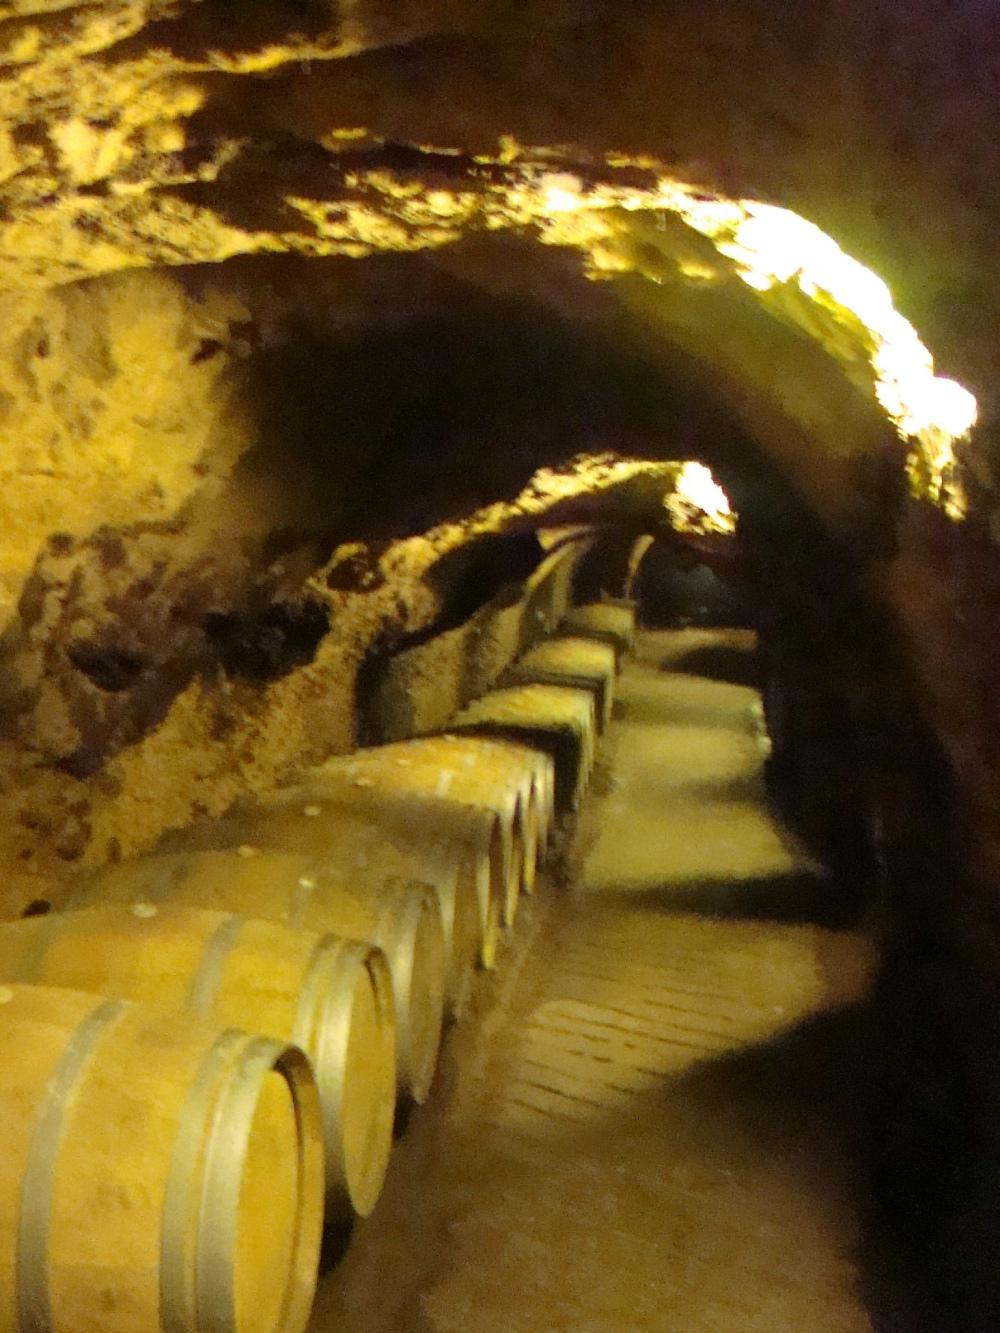 Winery in the Bekaa Valley, Lebanon